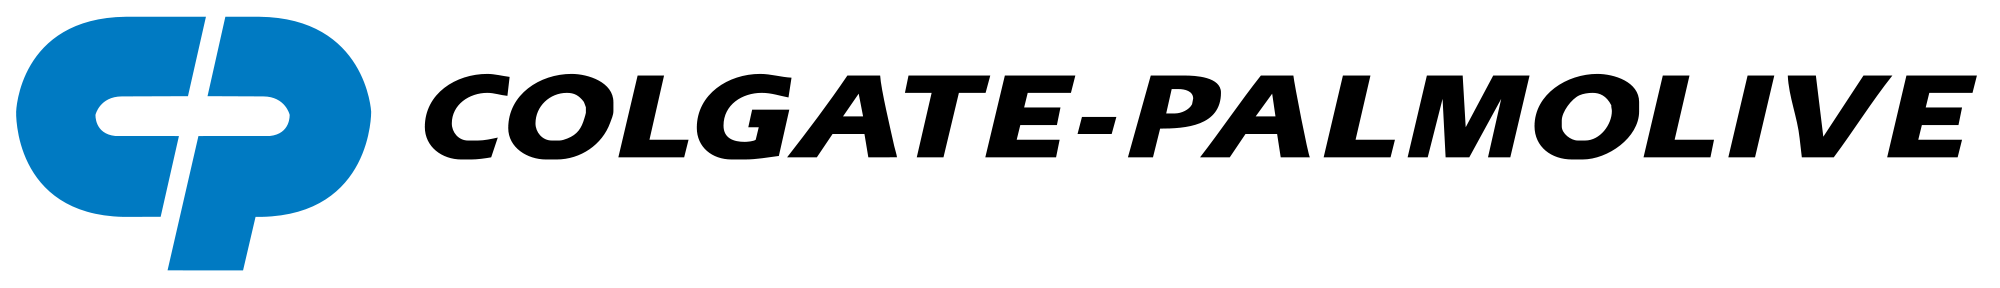 2000px-Colgate_palmolive_logo